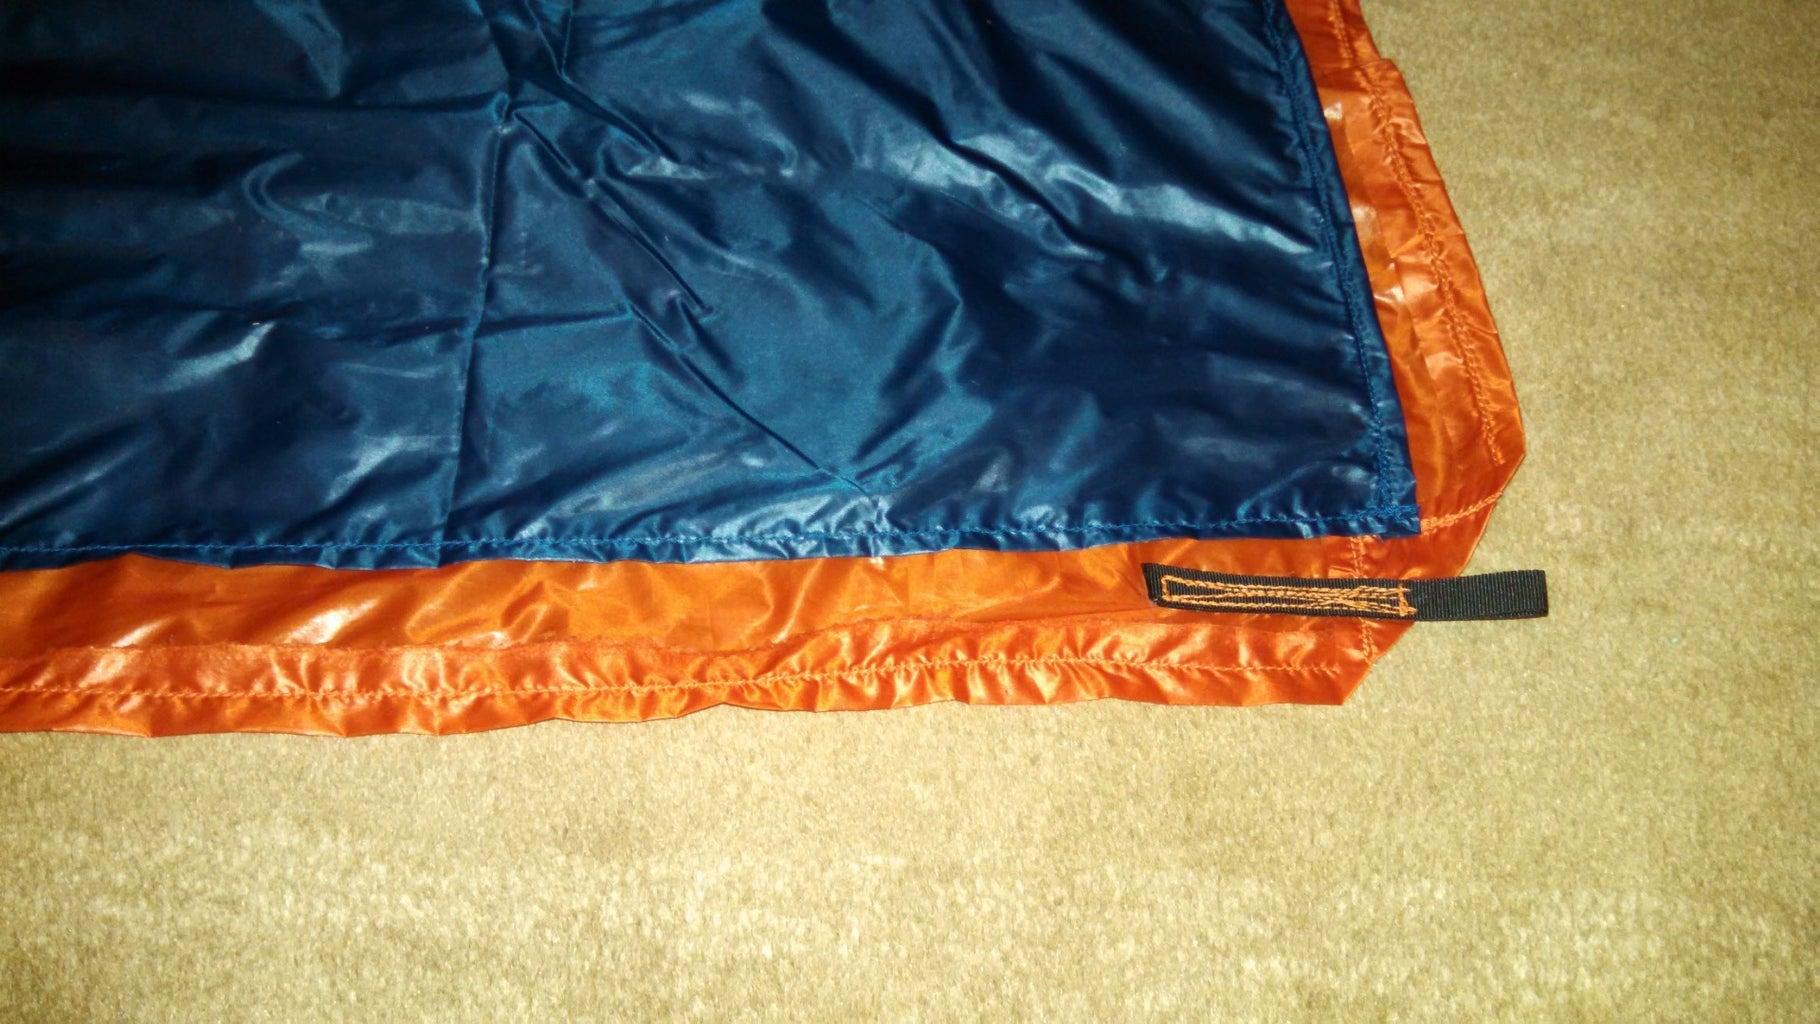 Sew in Grossgrain Loops for Suspension